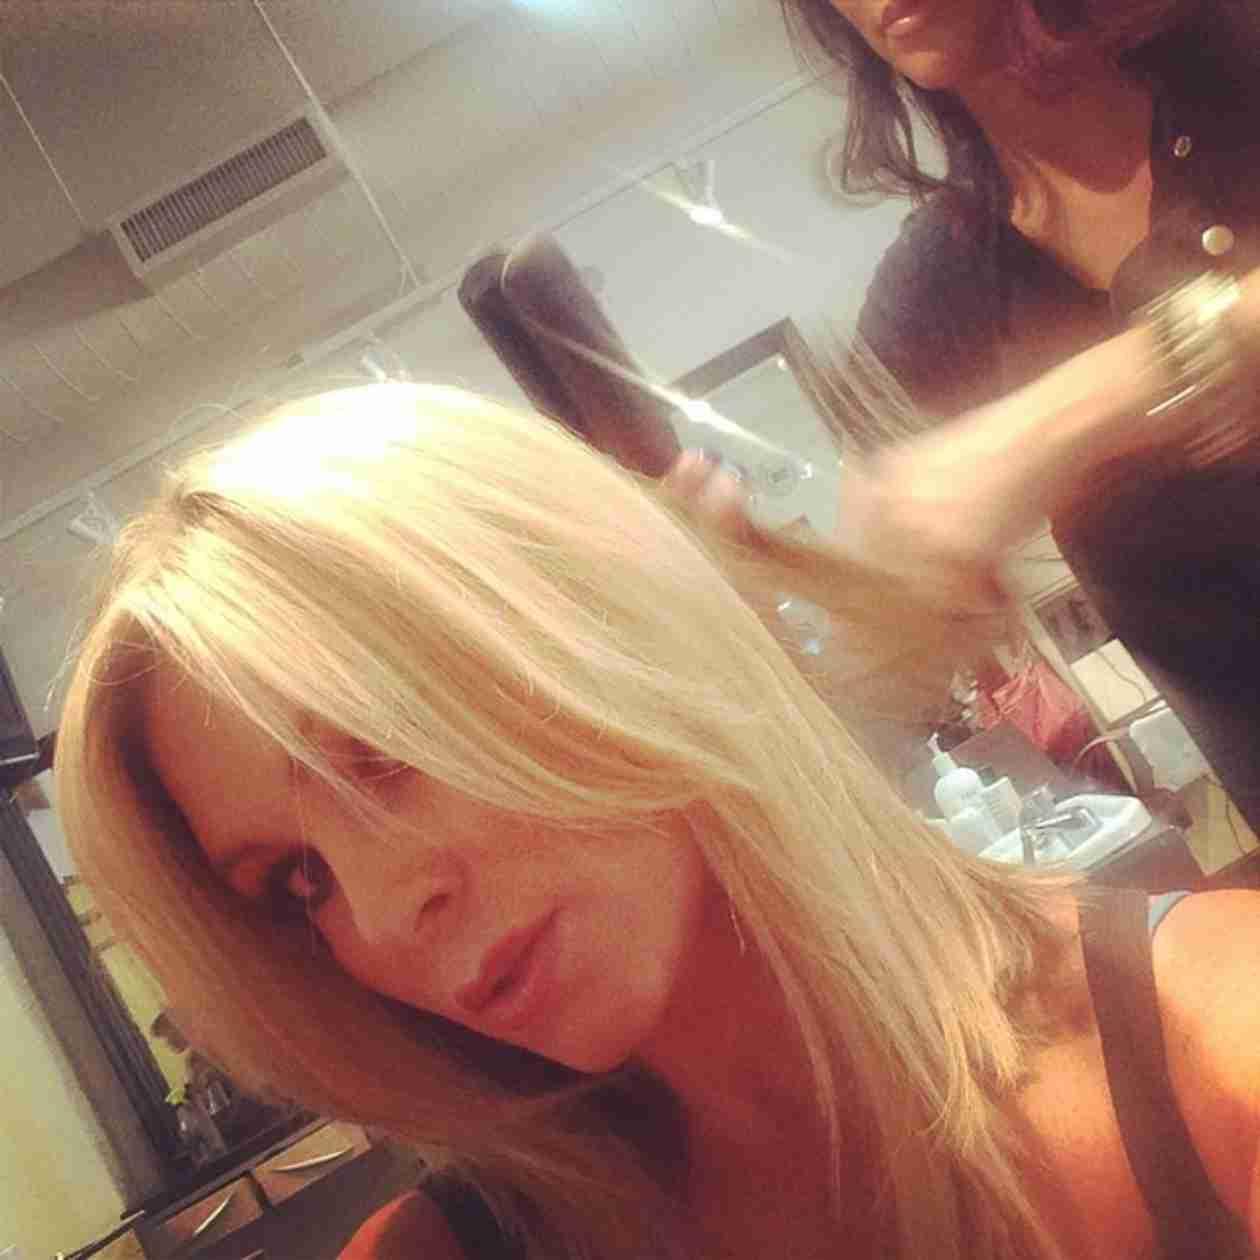 Tamra Barney Debuts New 'Do — She Got a Lob! (PHOTO)